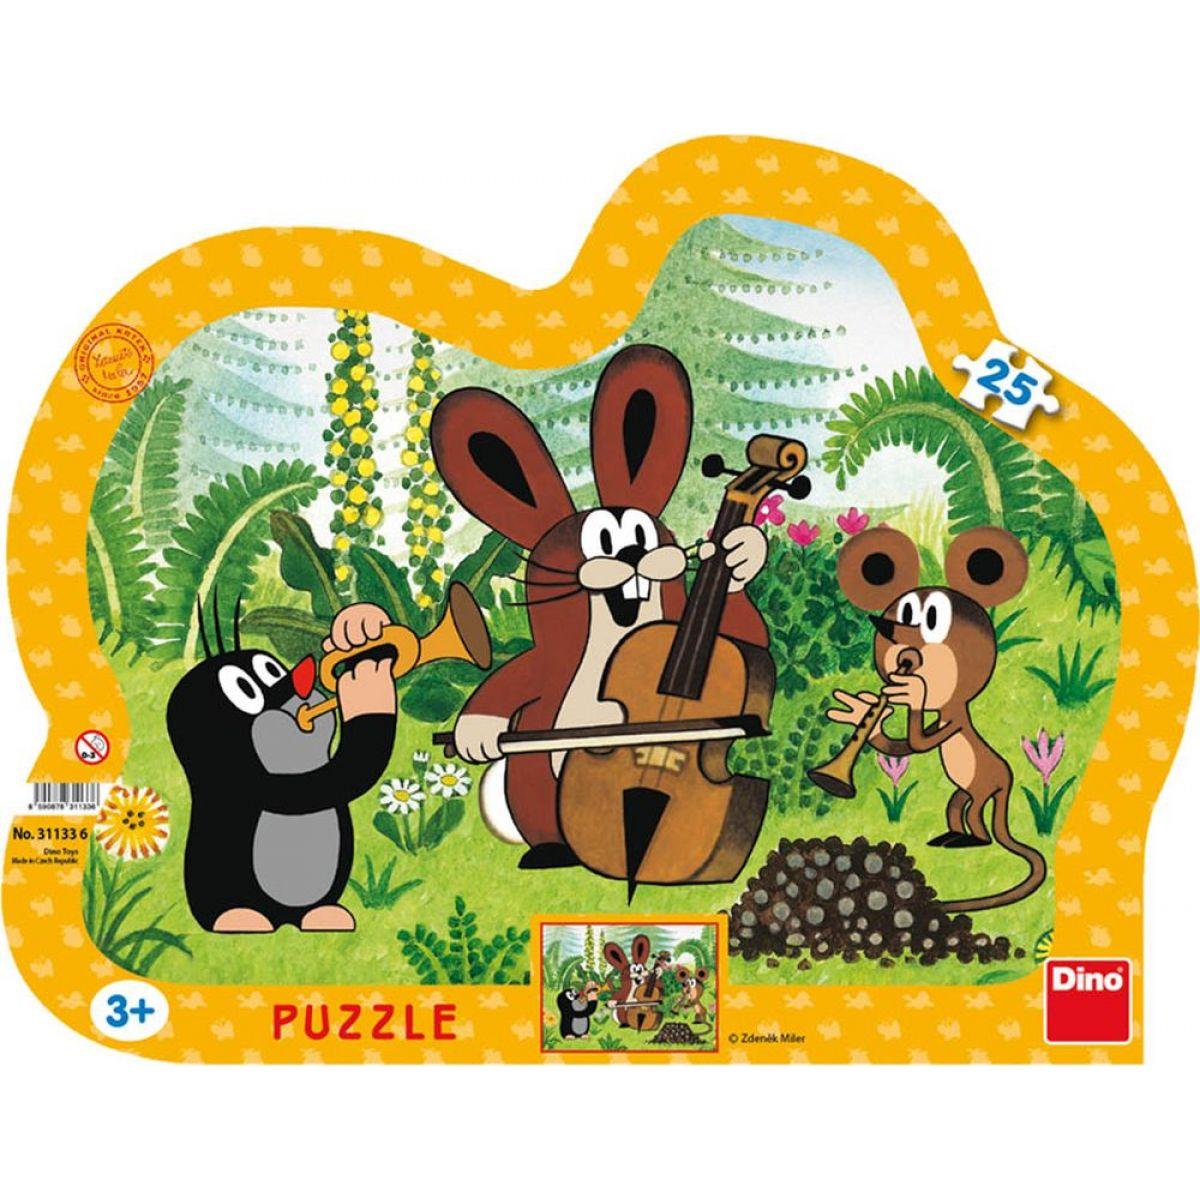 Dino Puzzle Krteček muzikant 25 dílků